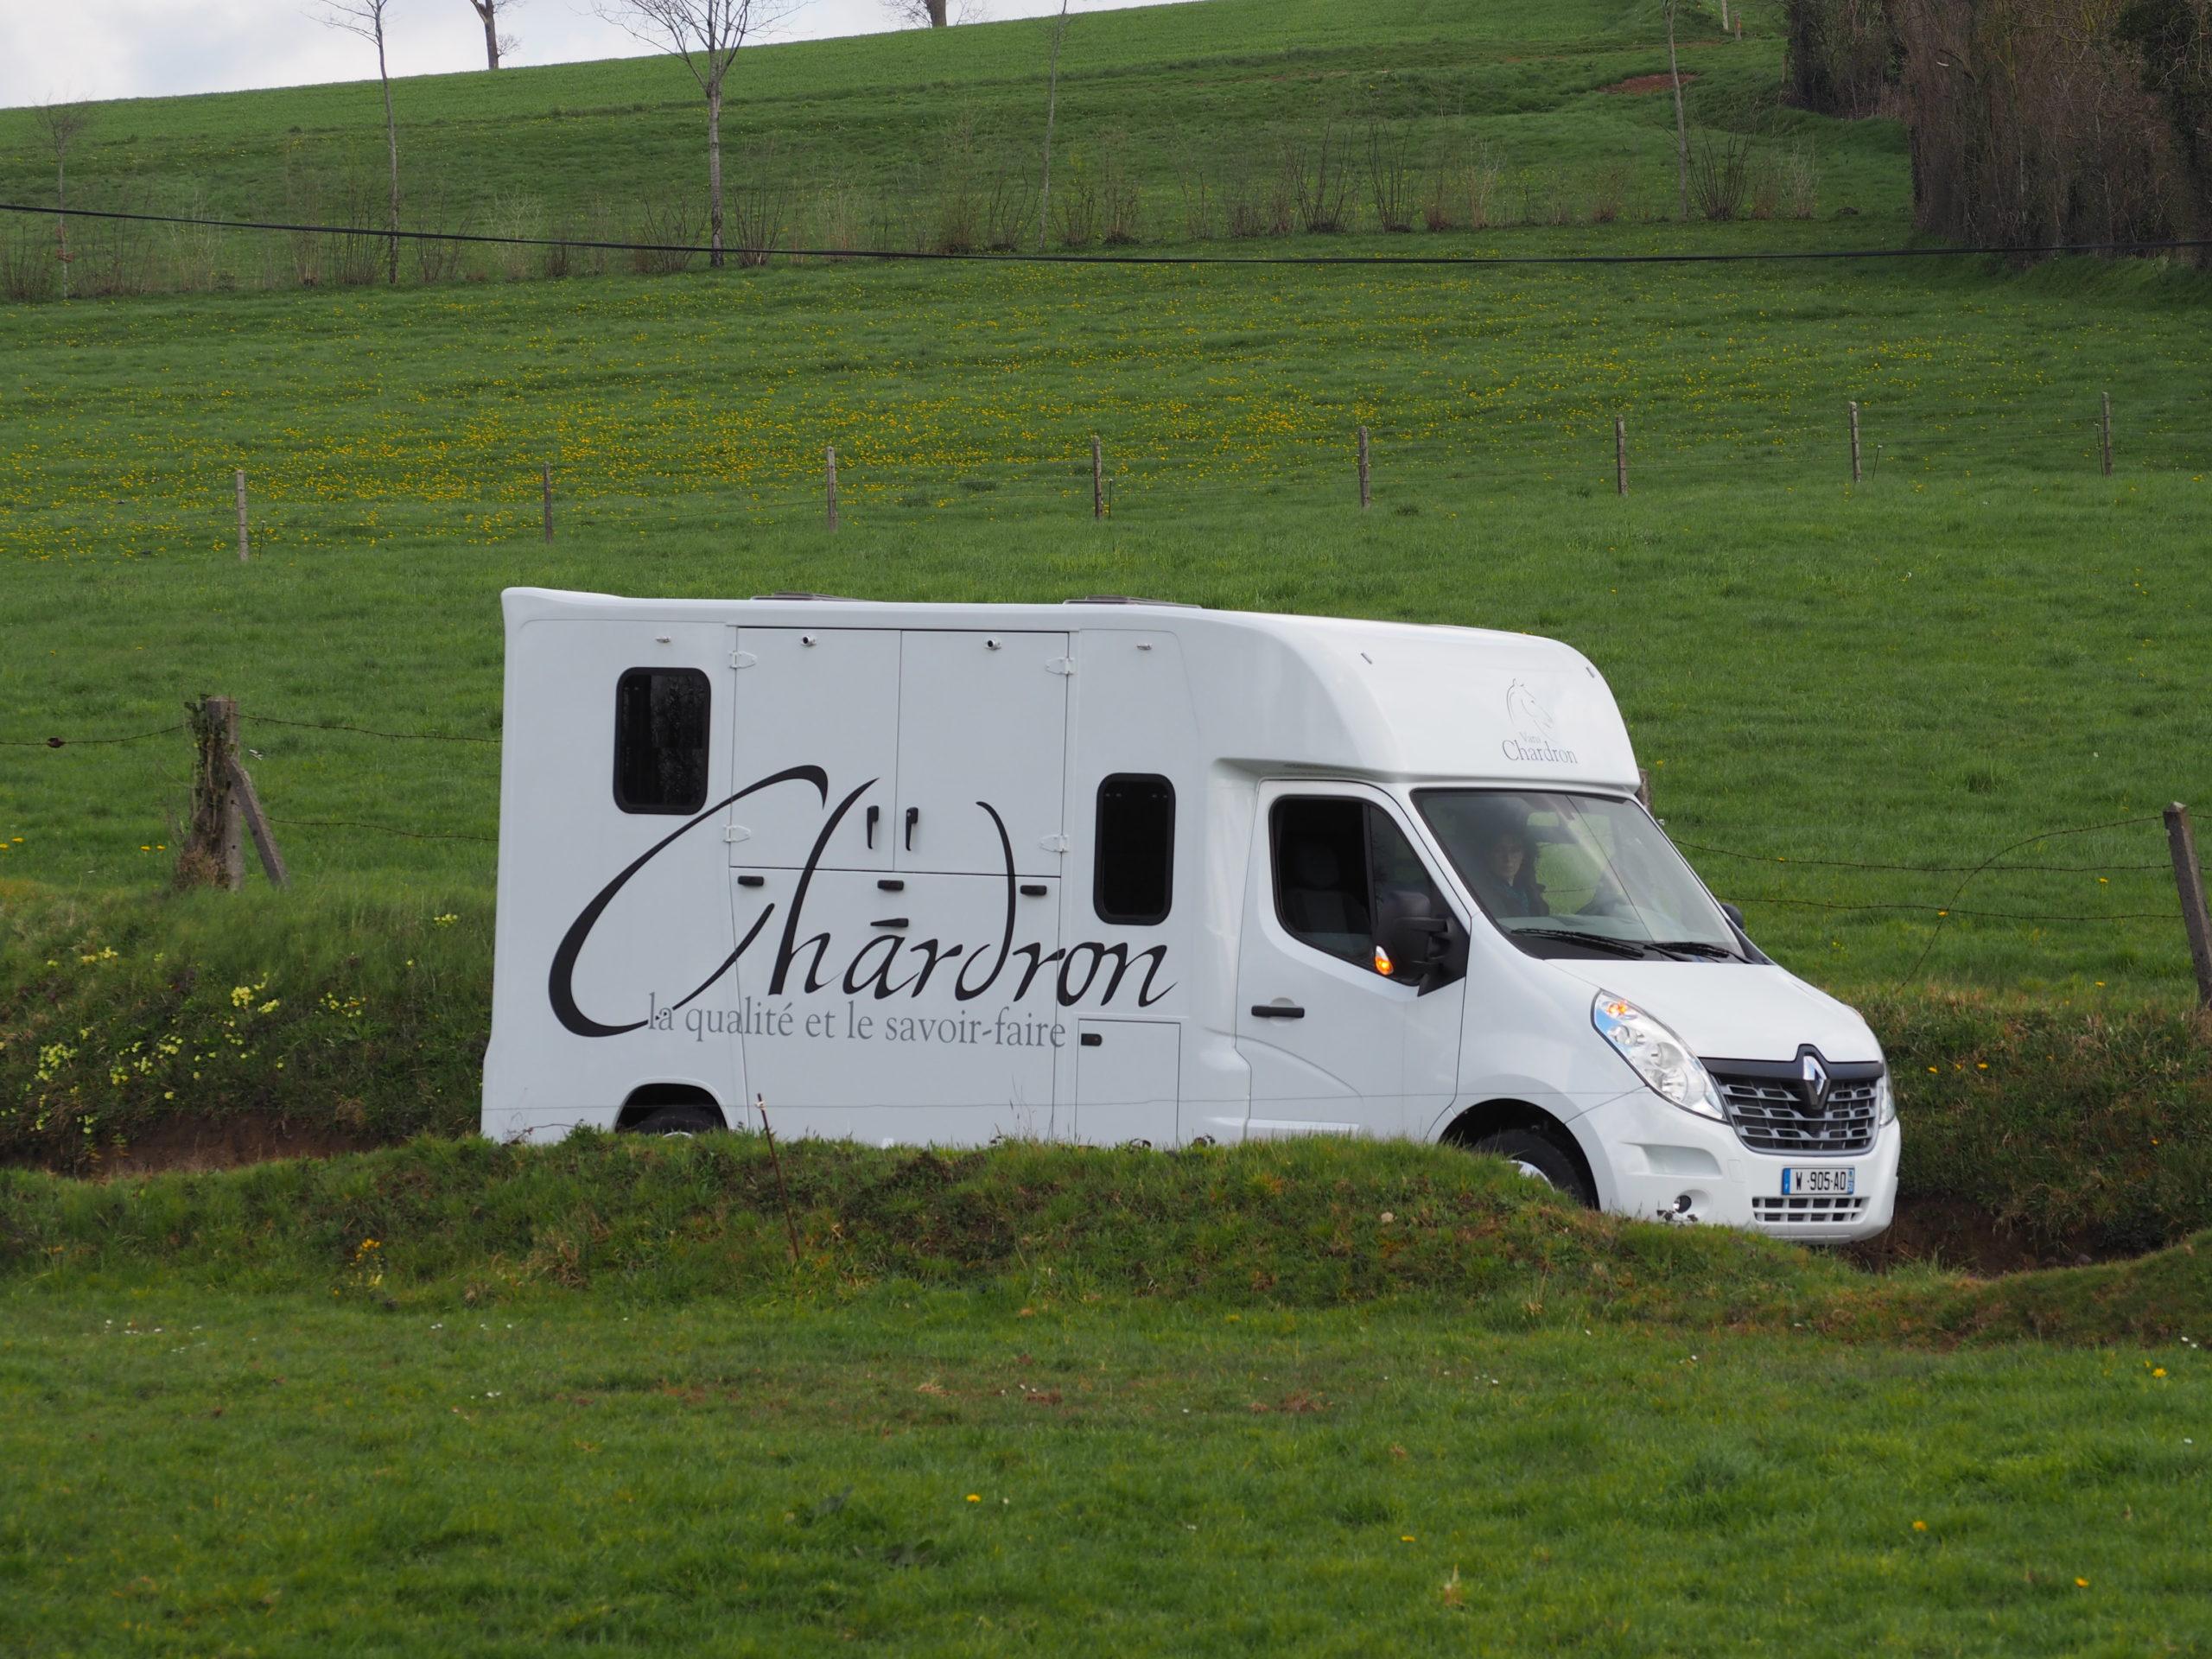 Vans Chardron stalle Deux Chevaux